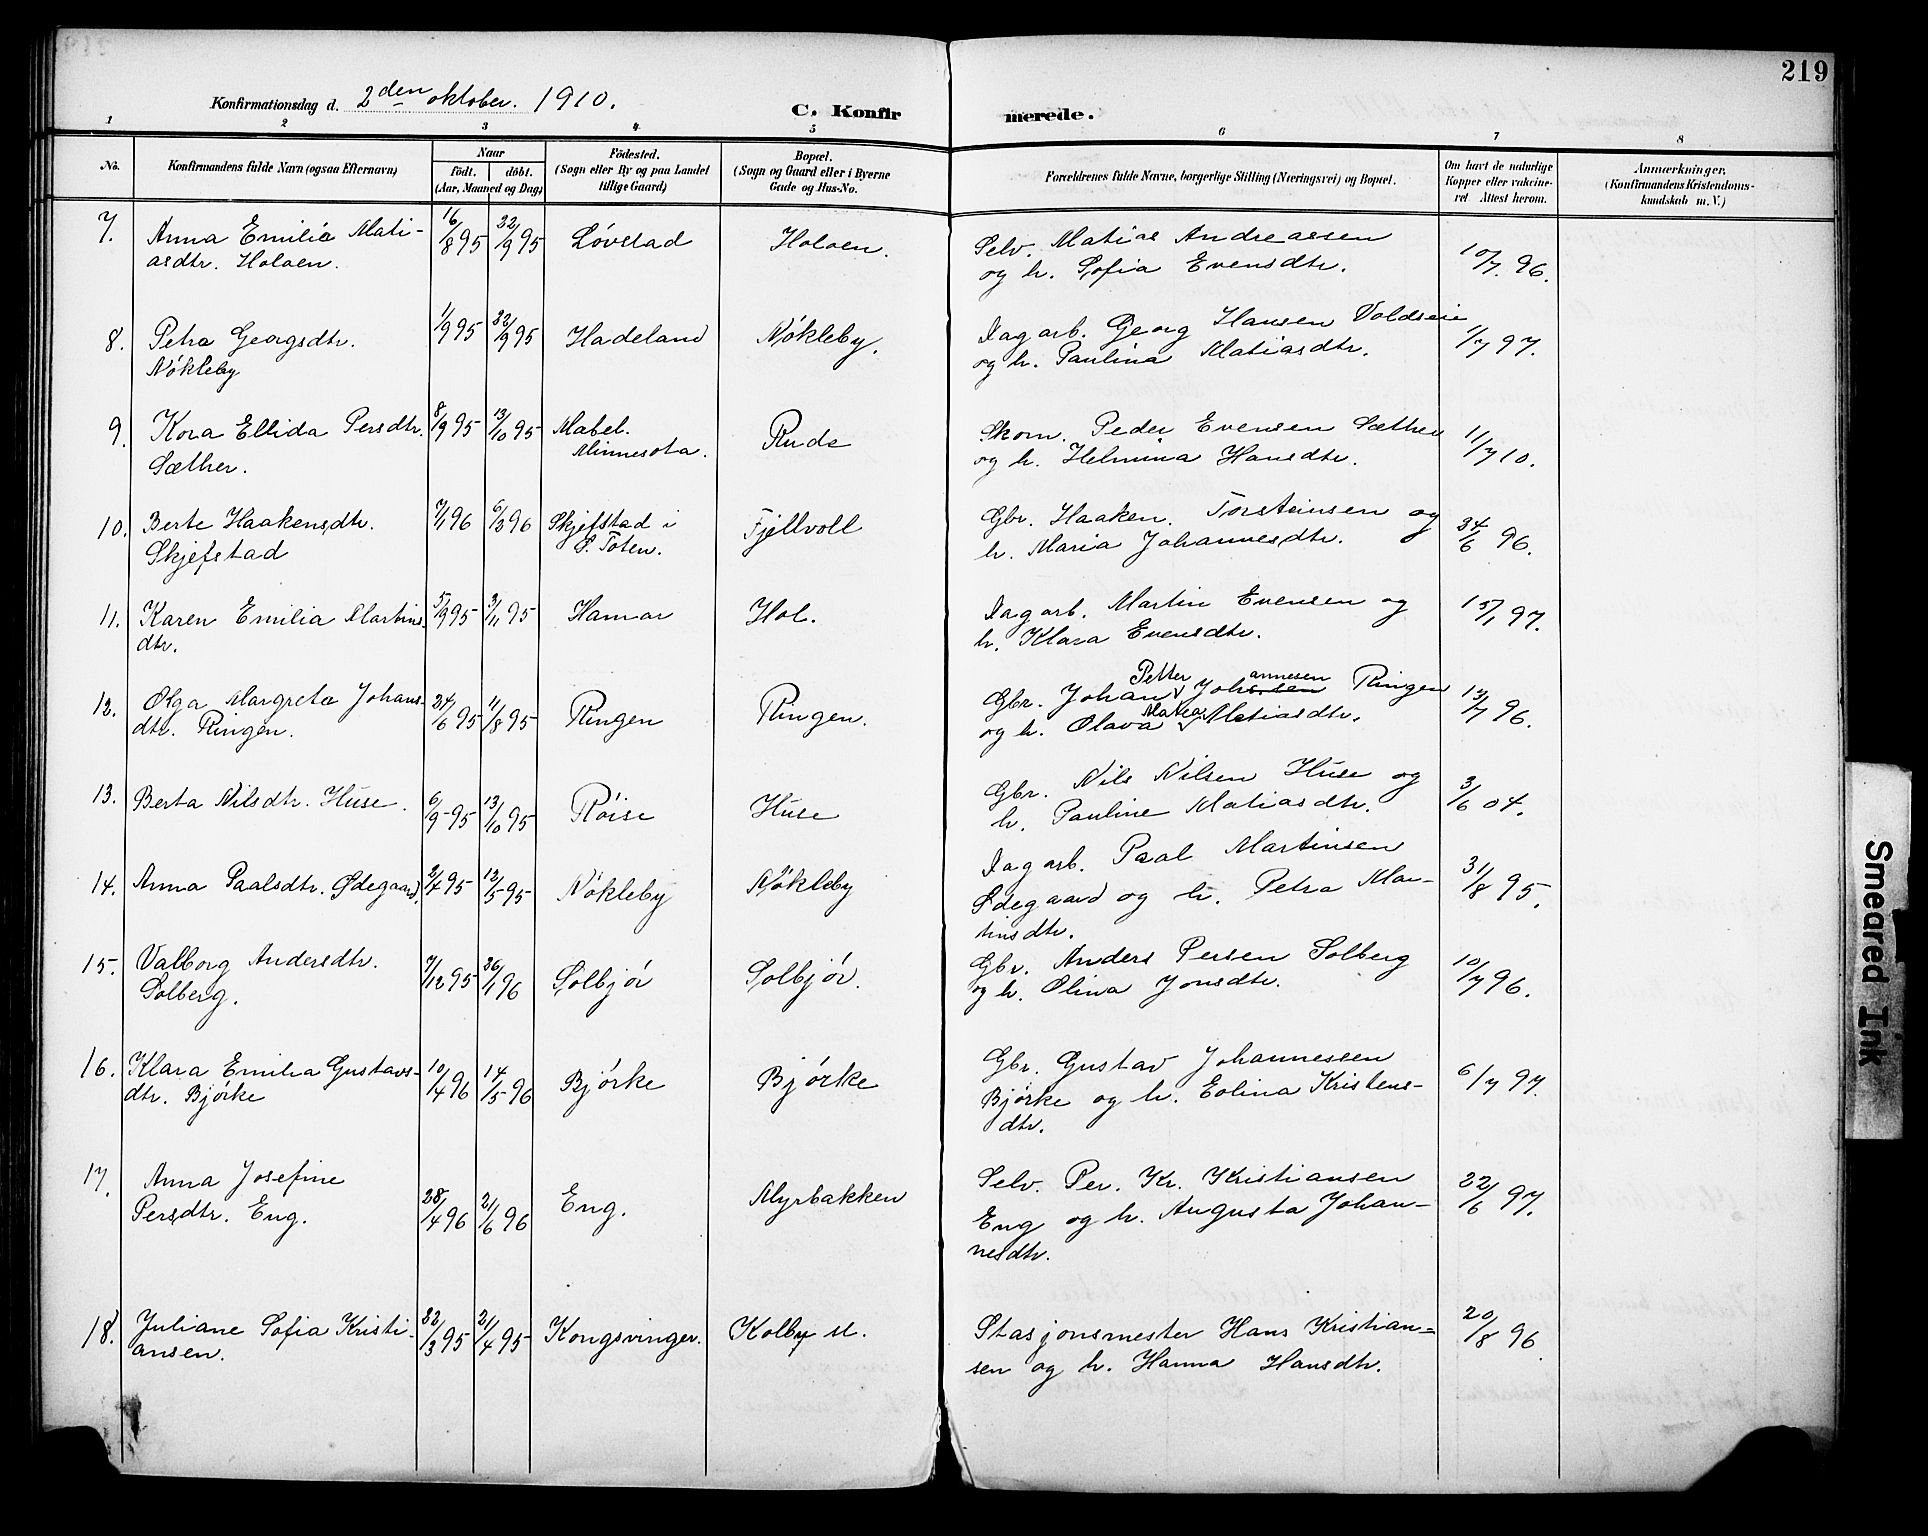 SAH, Vestre Toten prestekontor, H/Ha/Haa/L0013: Ministerialbok nr. 13, 1895-1911, s. 219